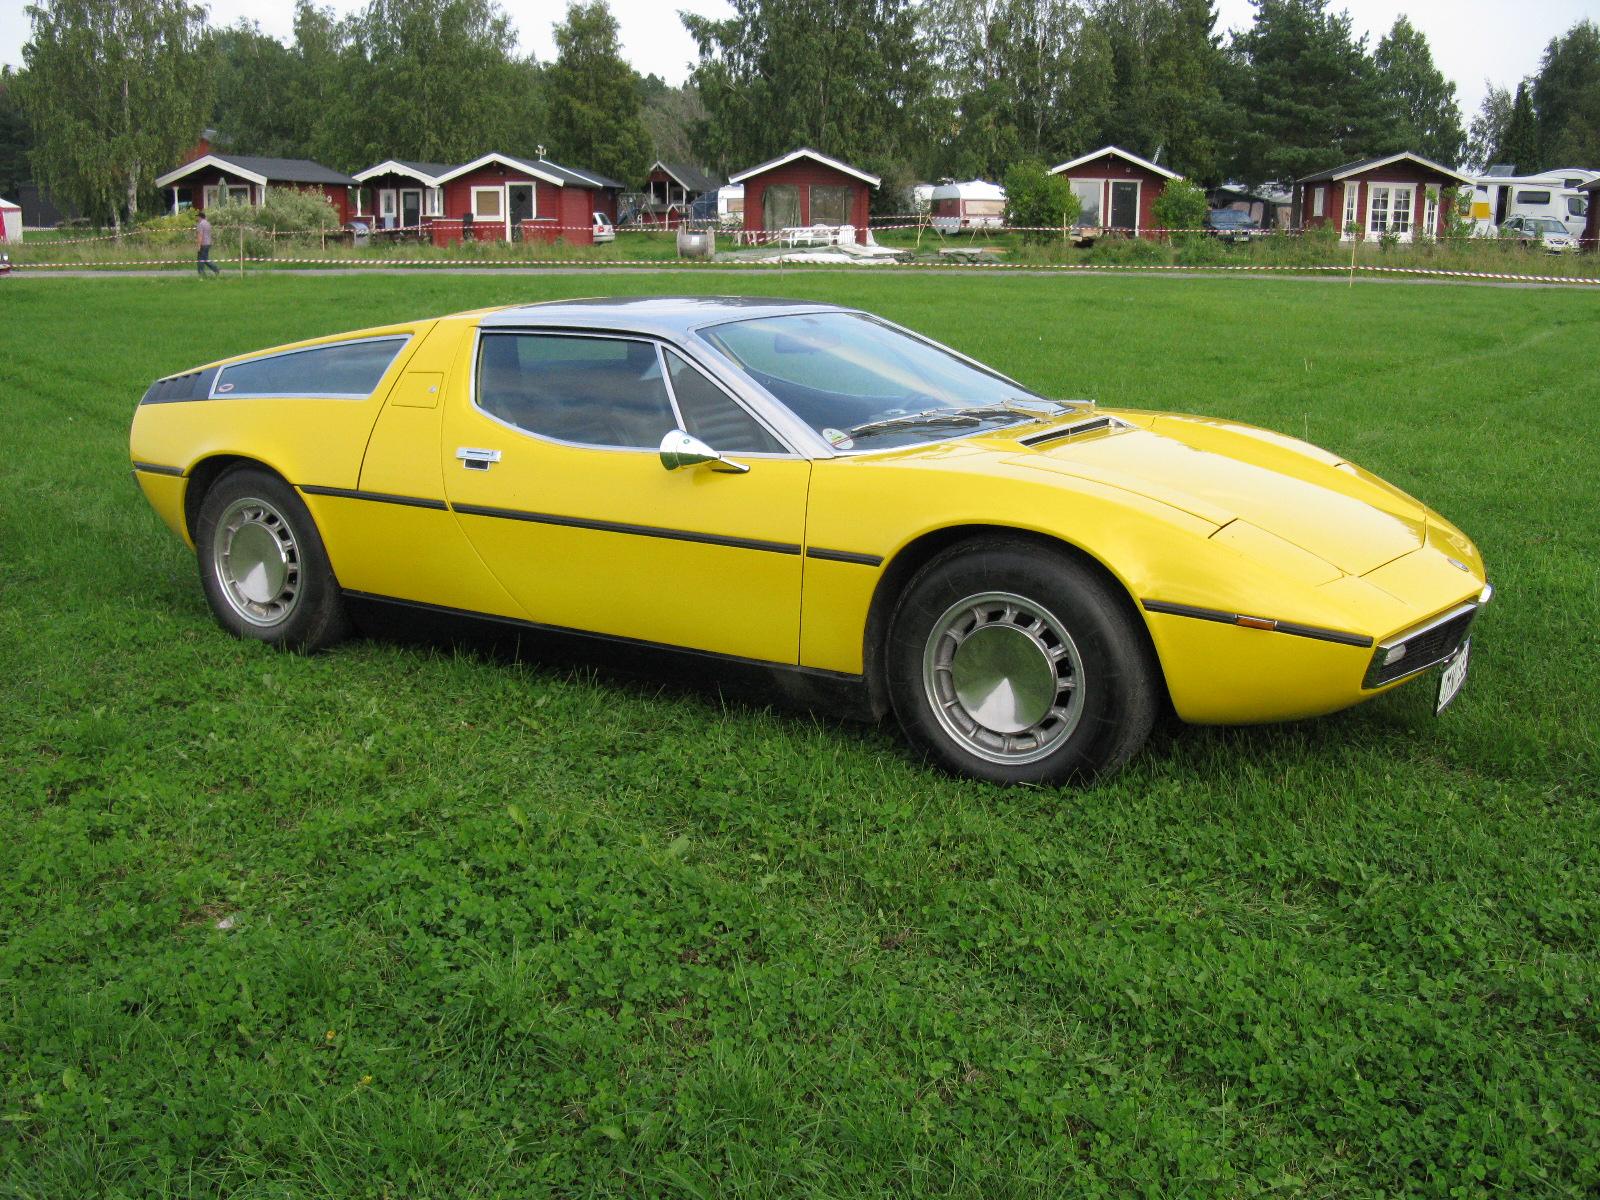 Maserati Bora Yellow